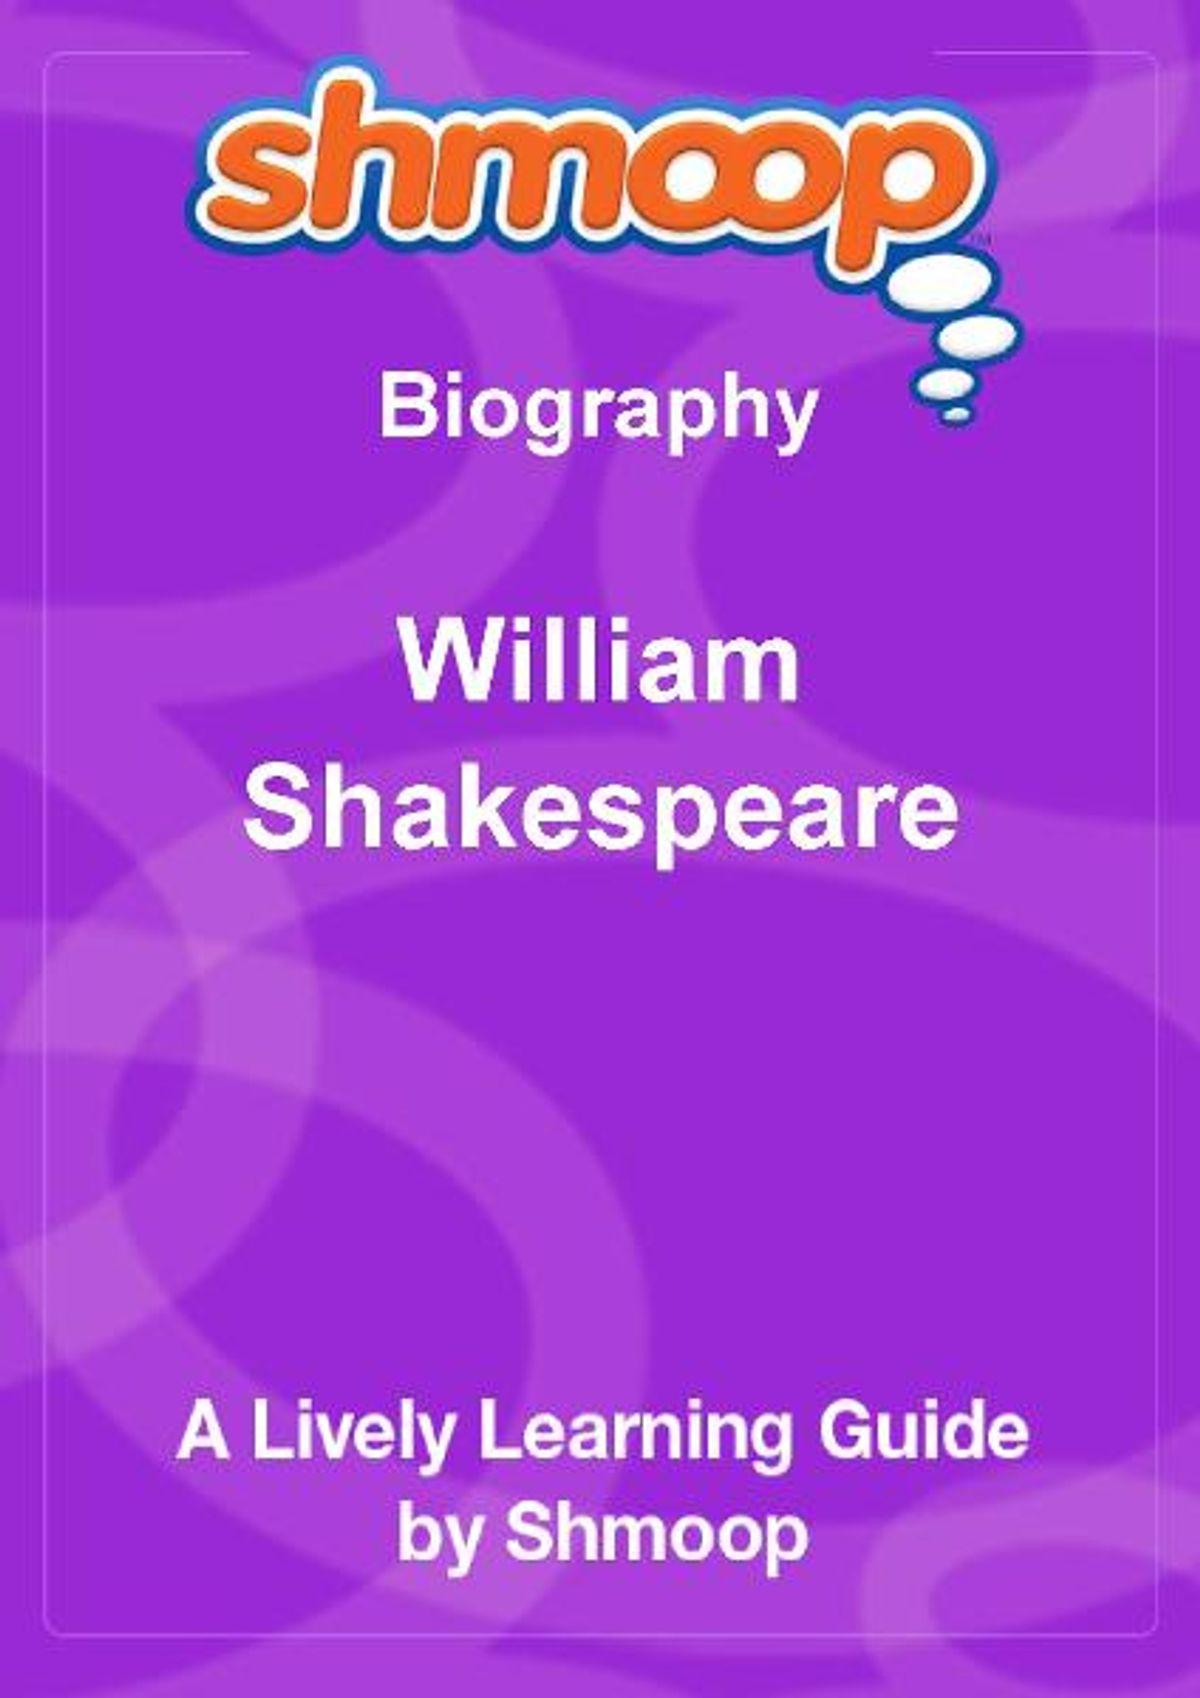 Shmoop Biography Guide William Shakespeare